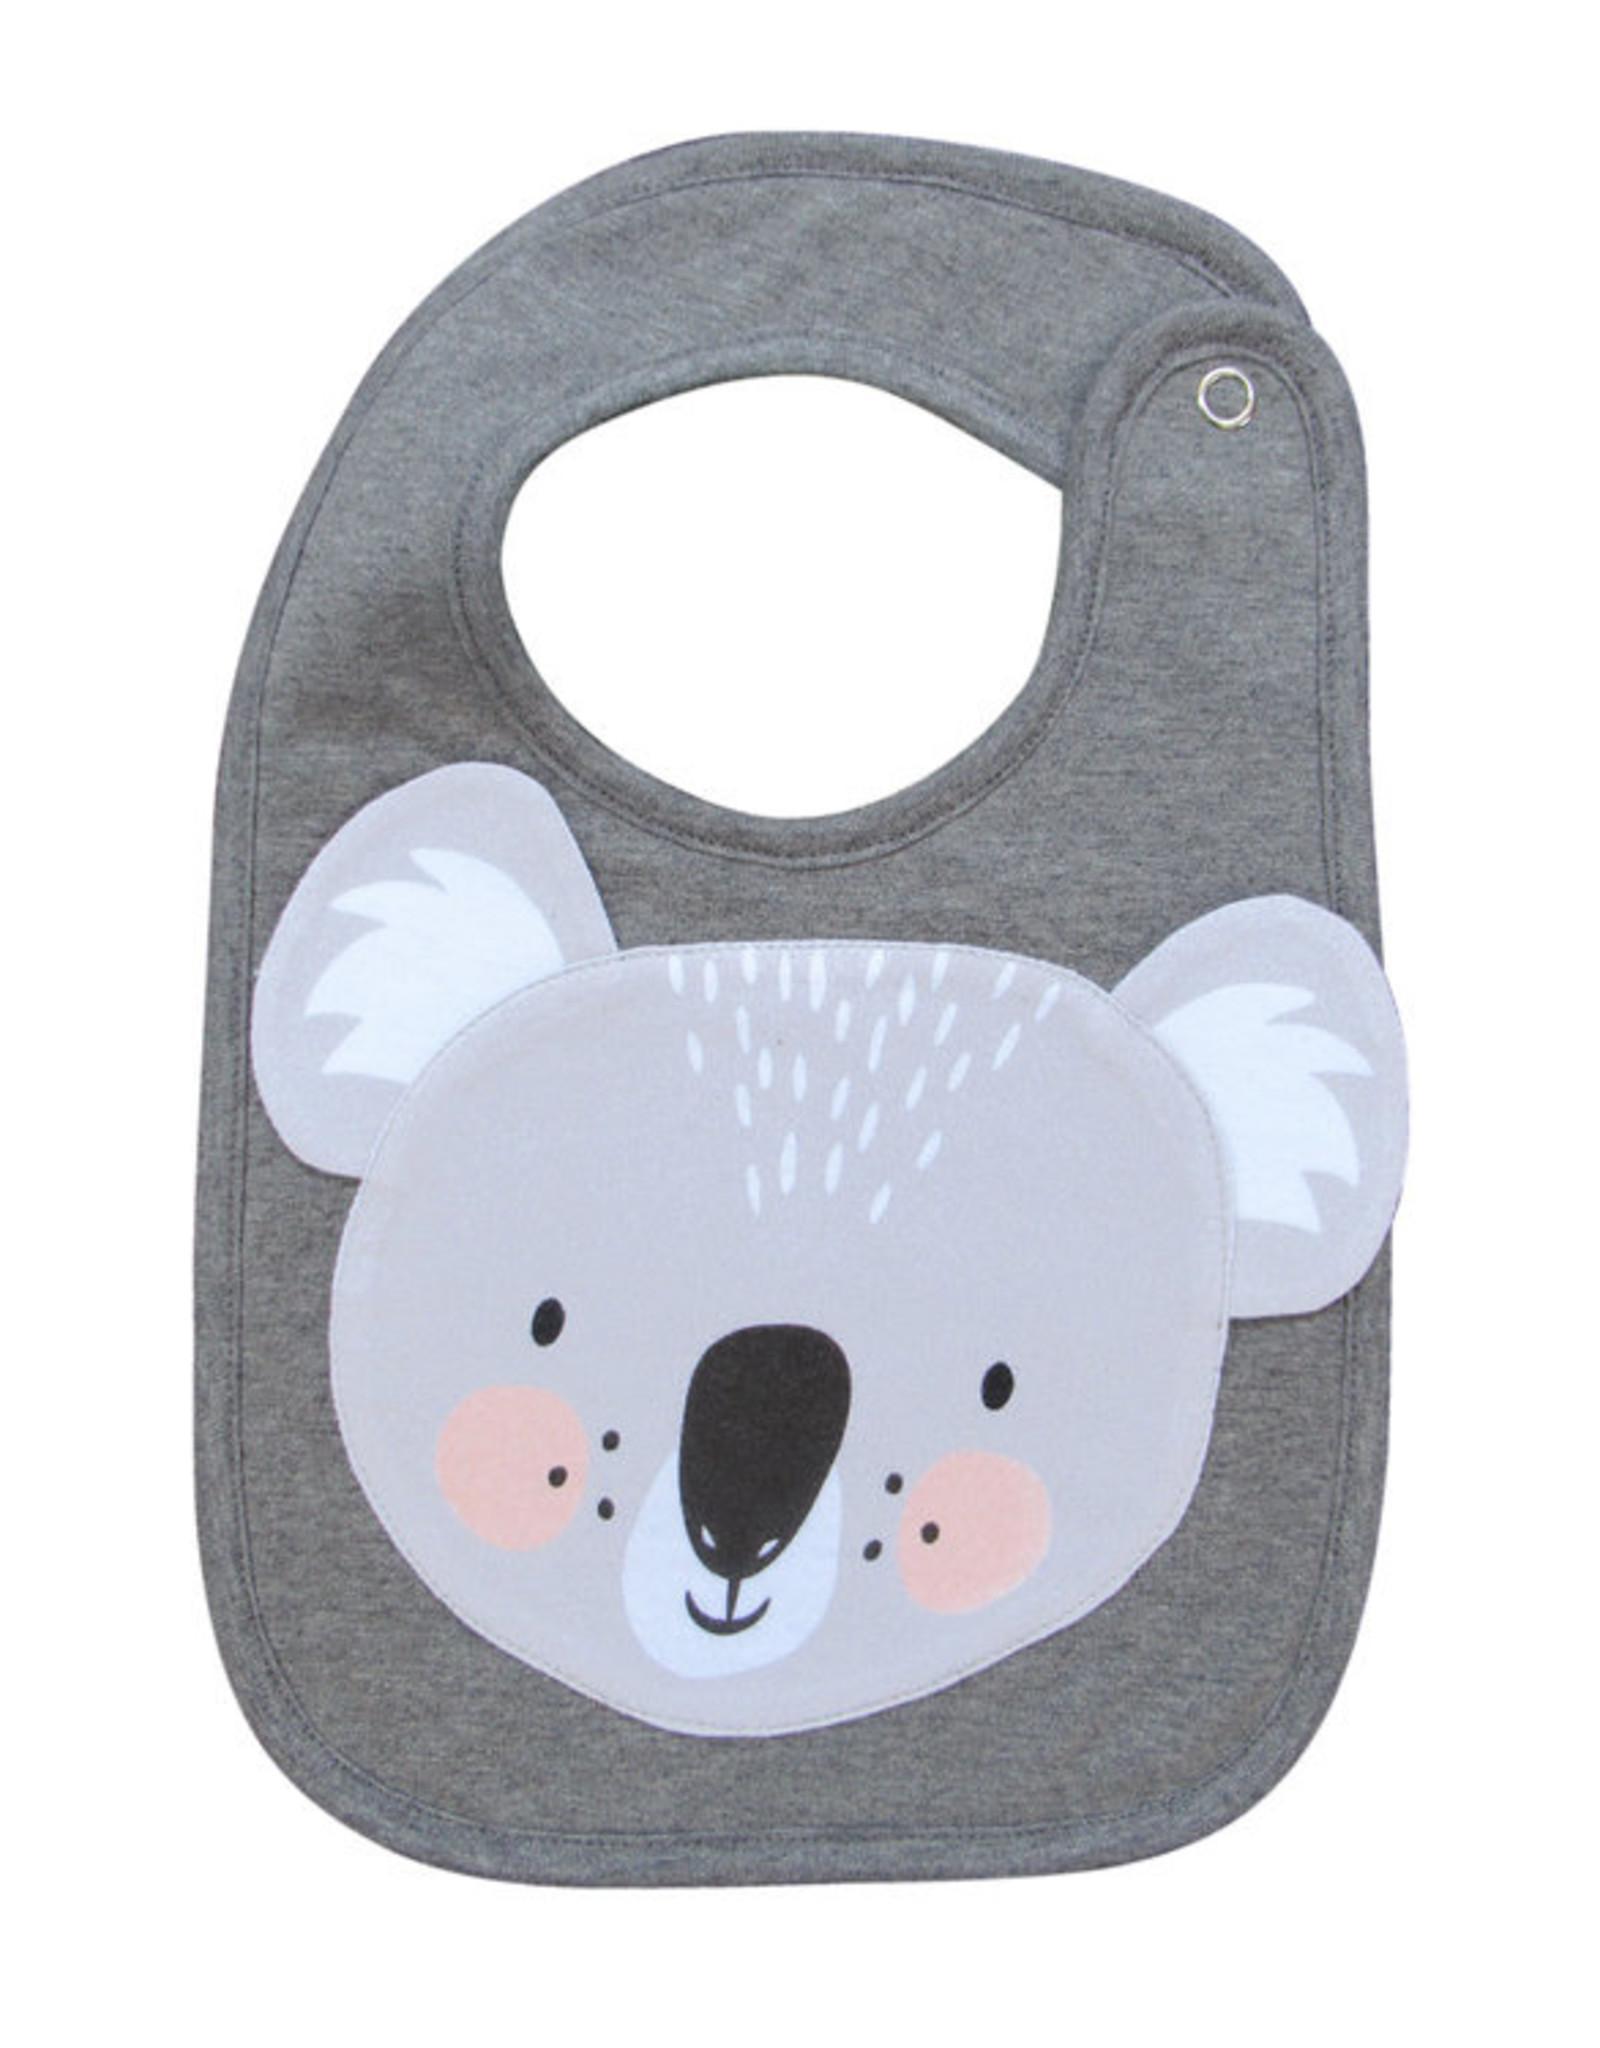 Mister Fly Mister Fly Bib - Koala